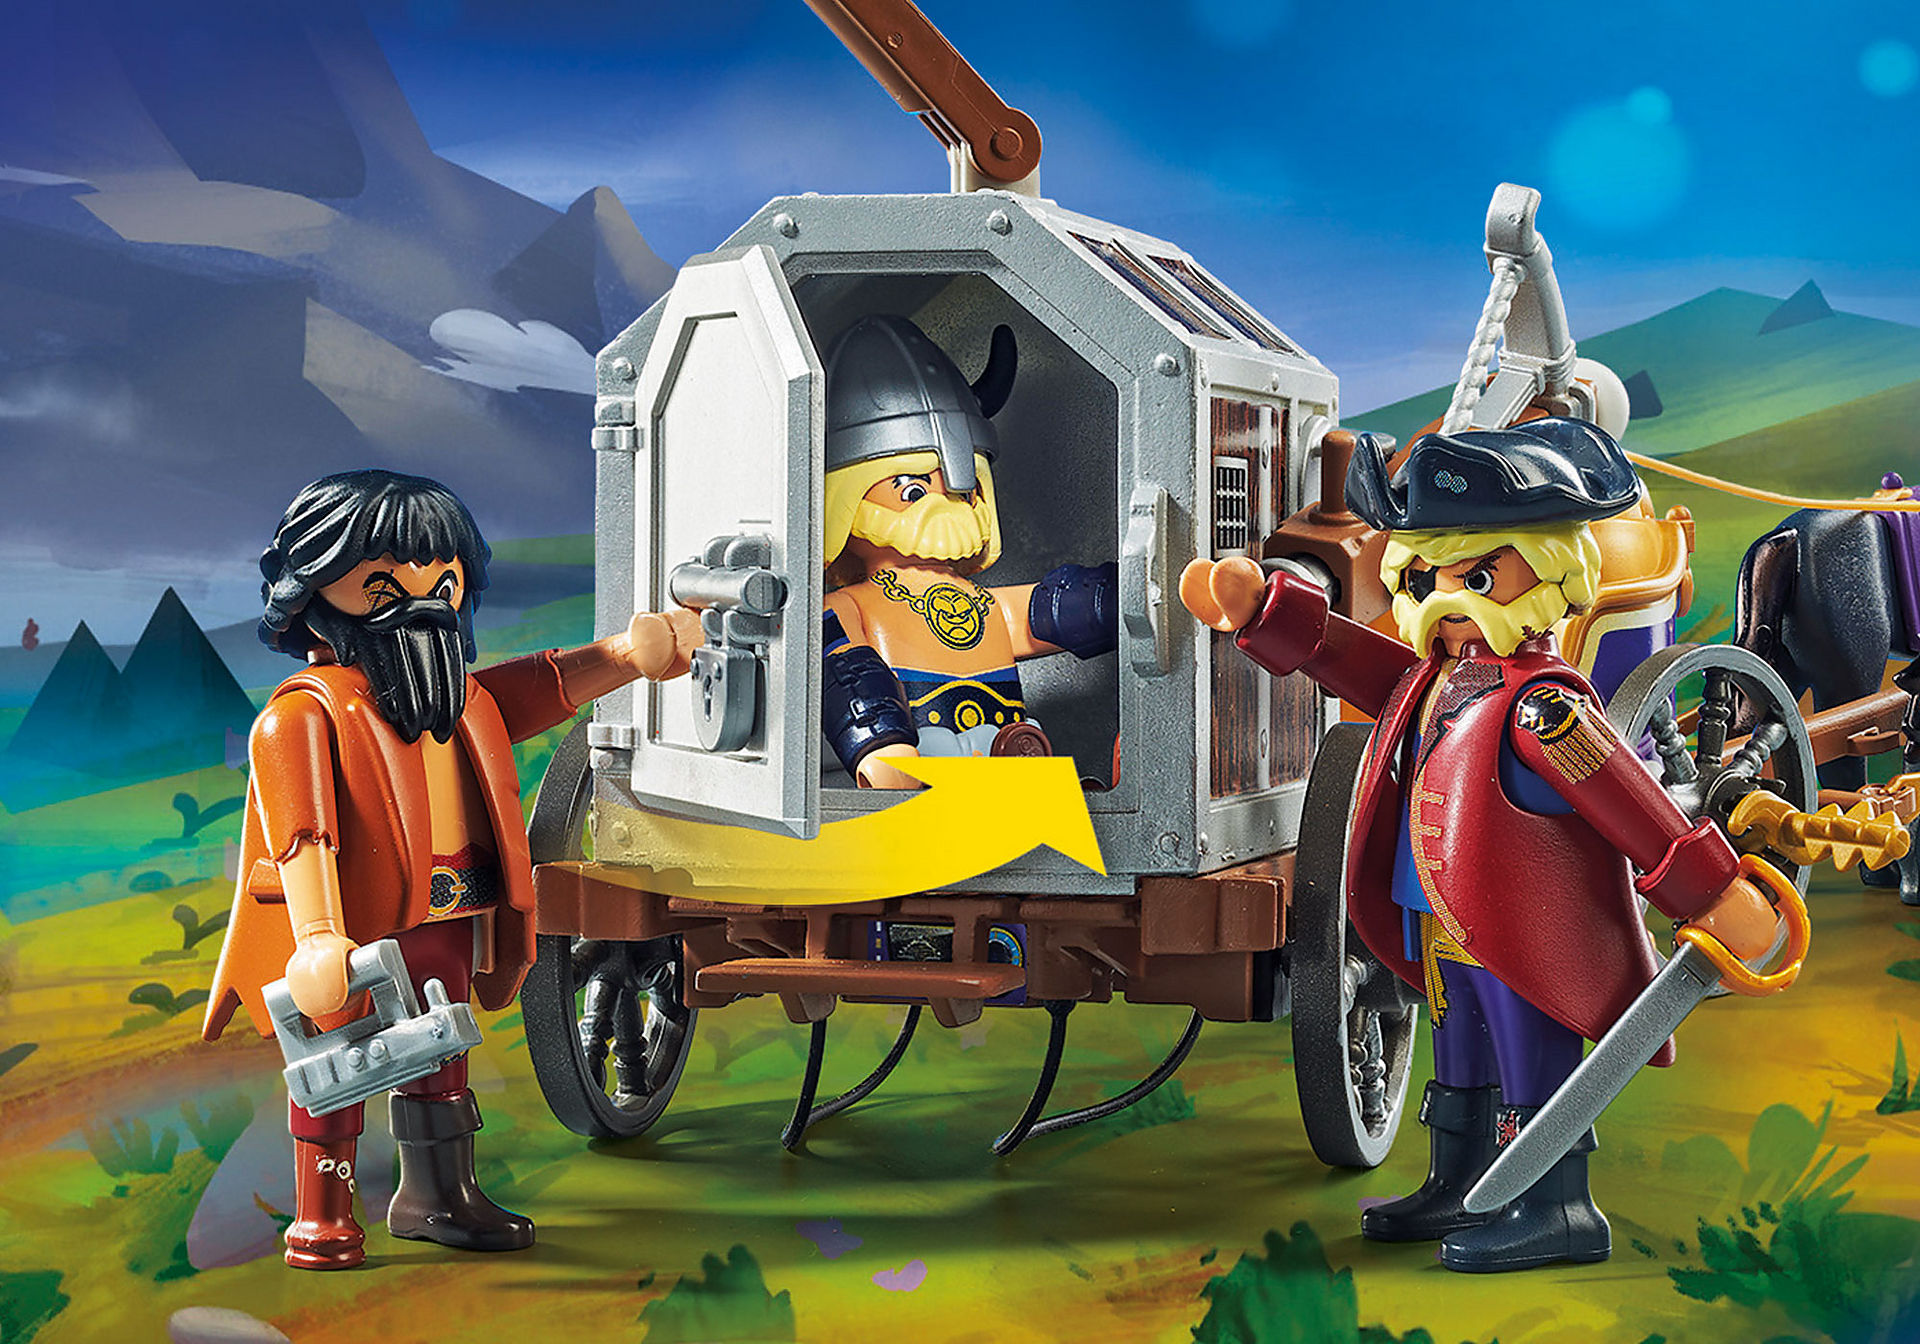 70073 PLAYMOBIL: THE MOVIE Charlie con carro prigione zoom image5